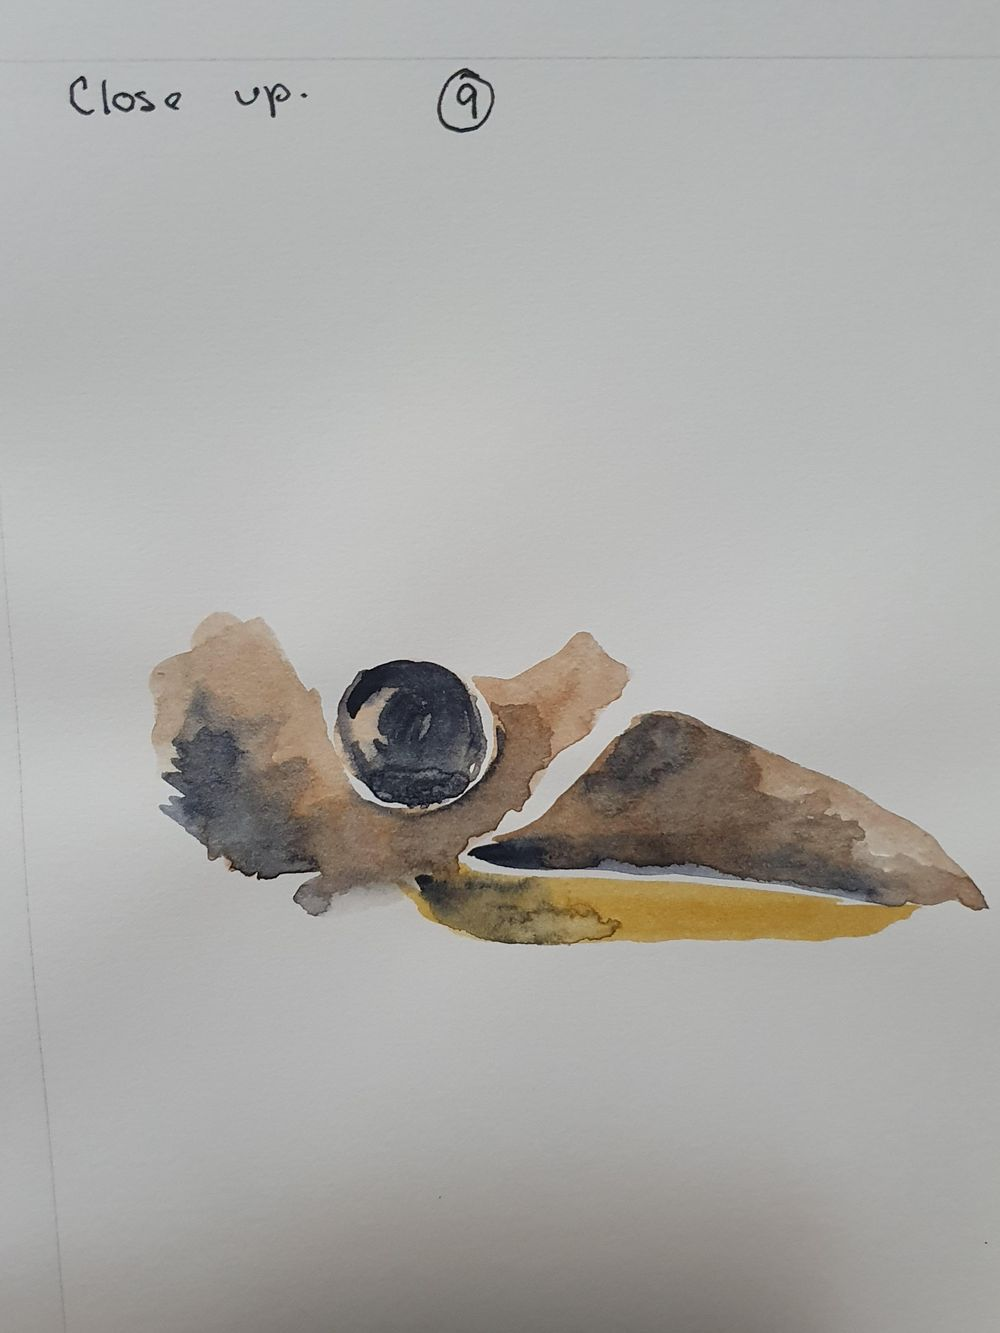 Kay Kookaburra - image 9 - student project